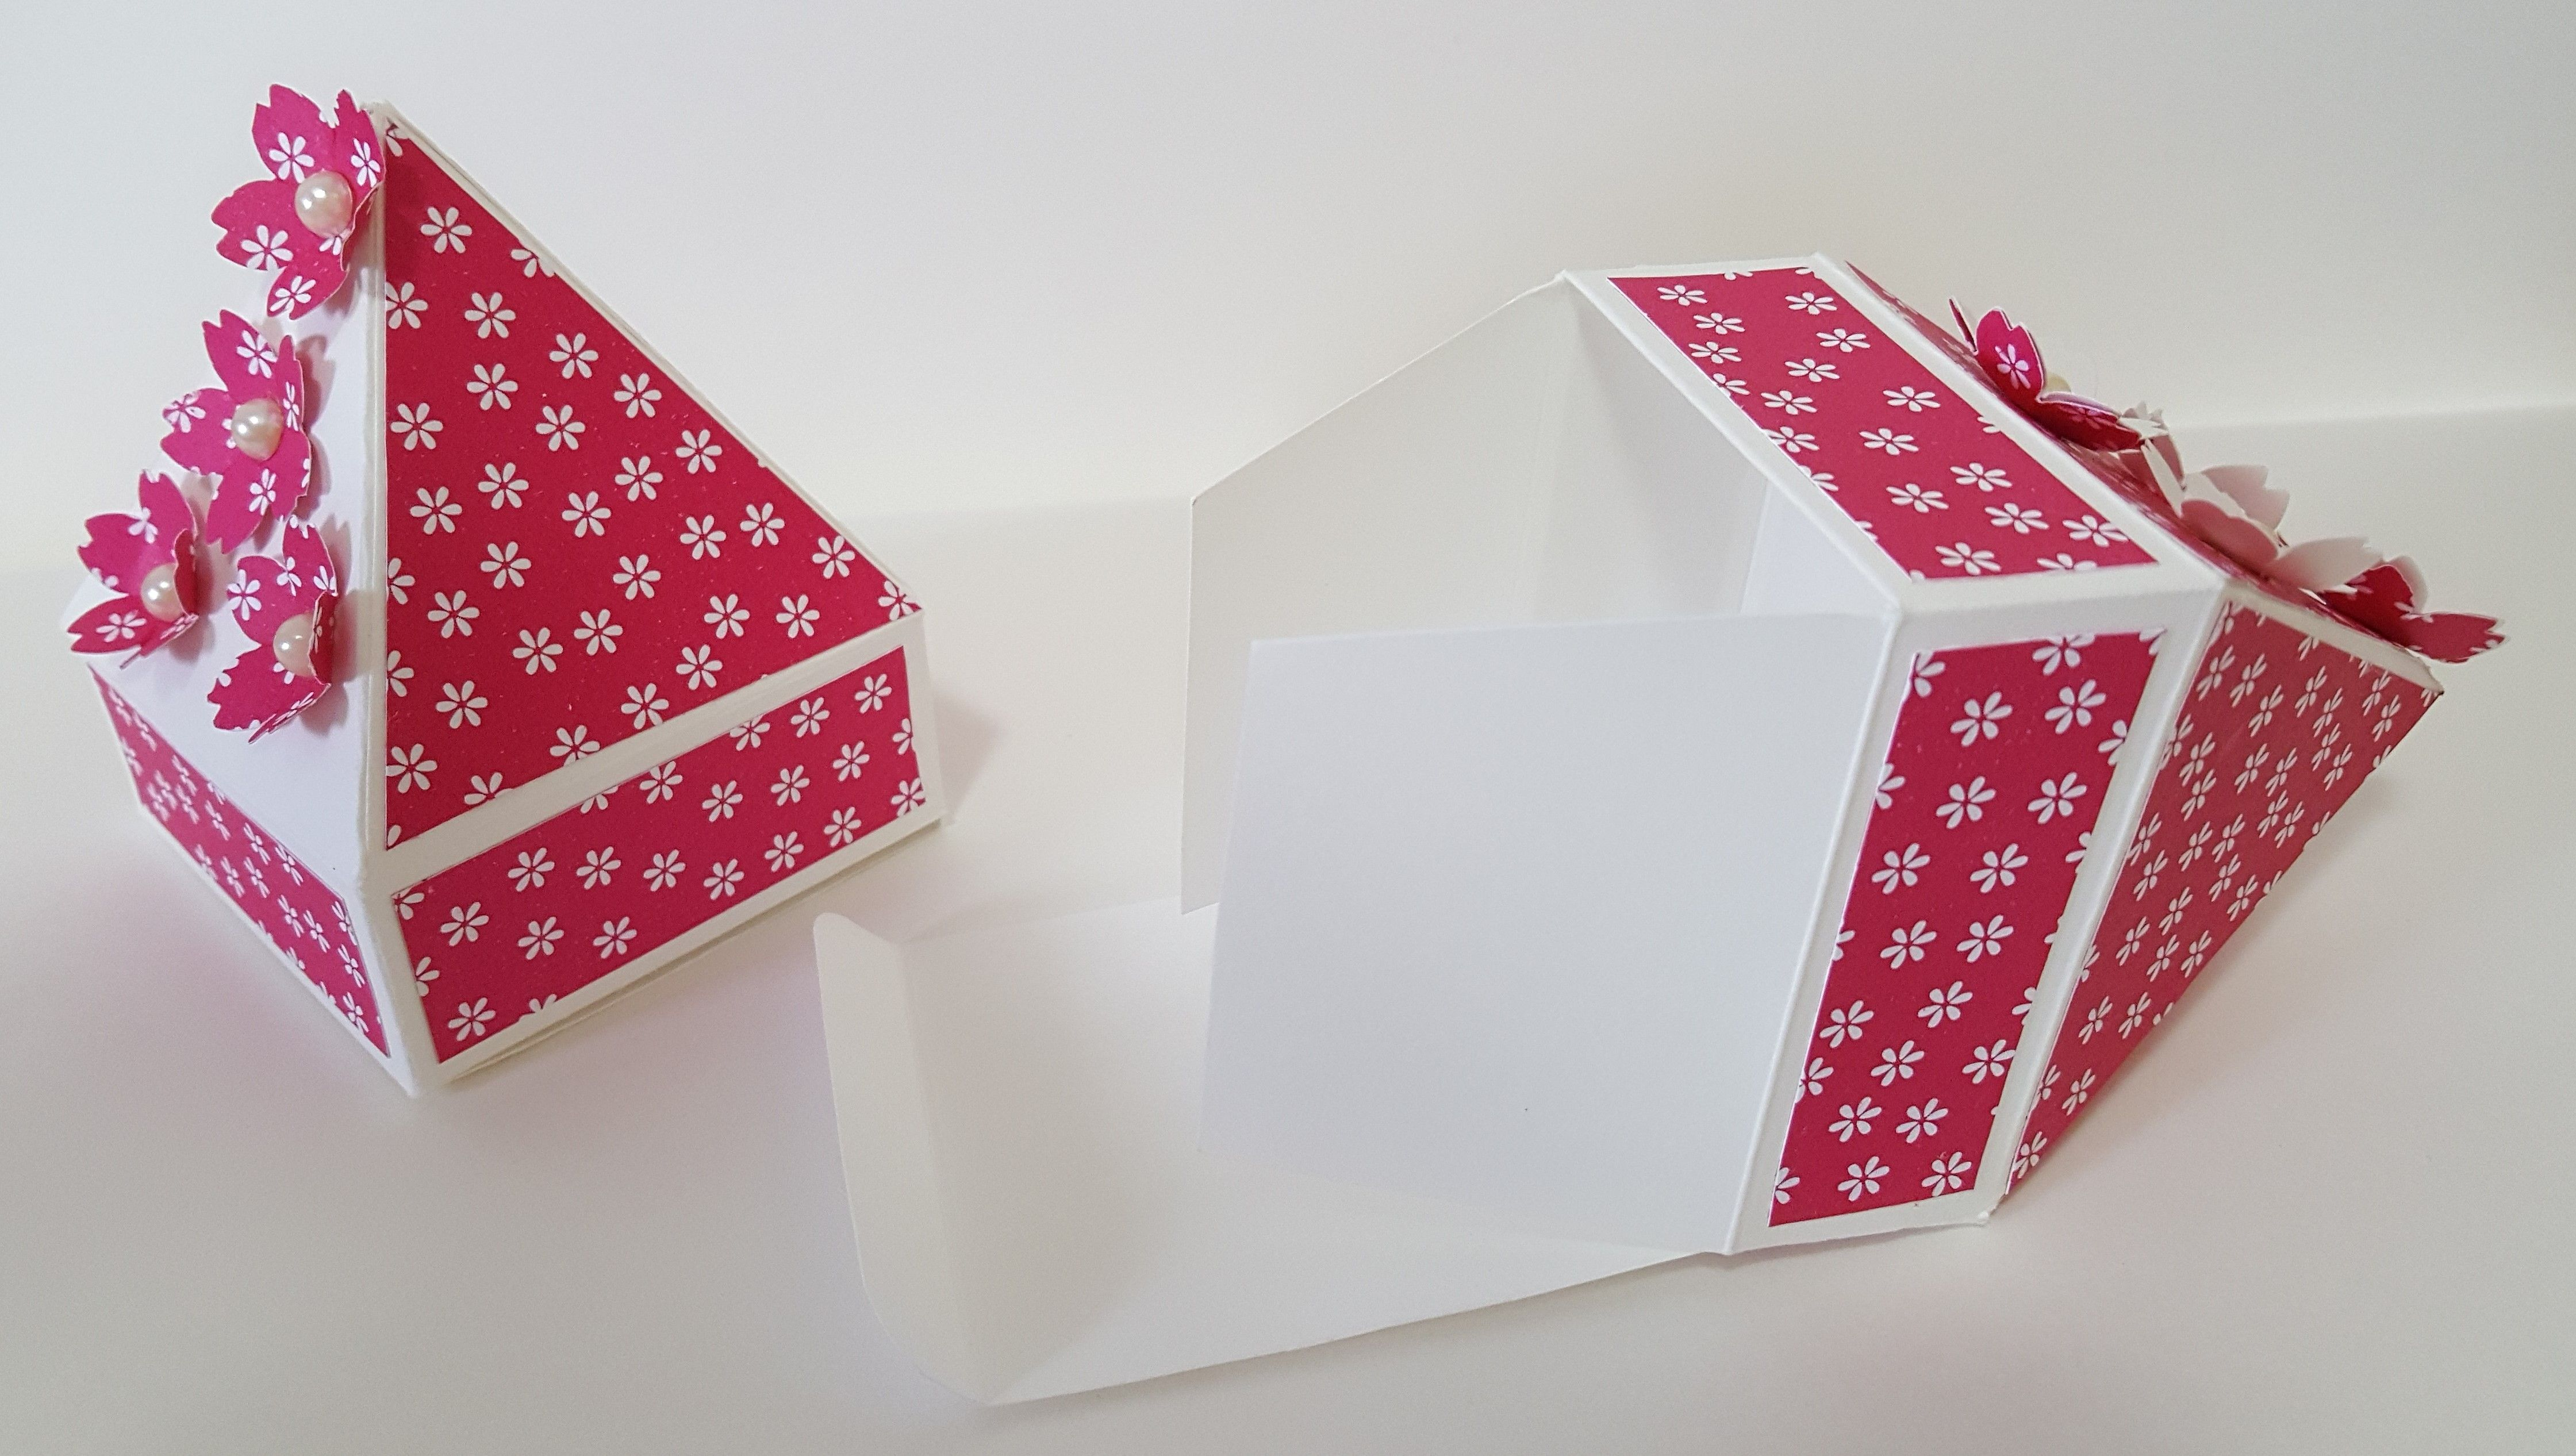 Flower Pyramid Box, for Easter Eggs.